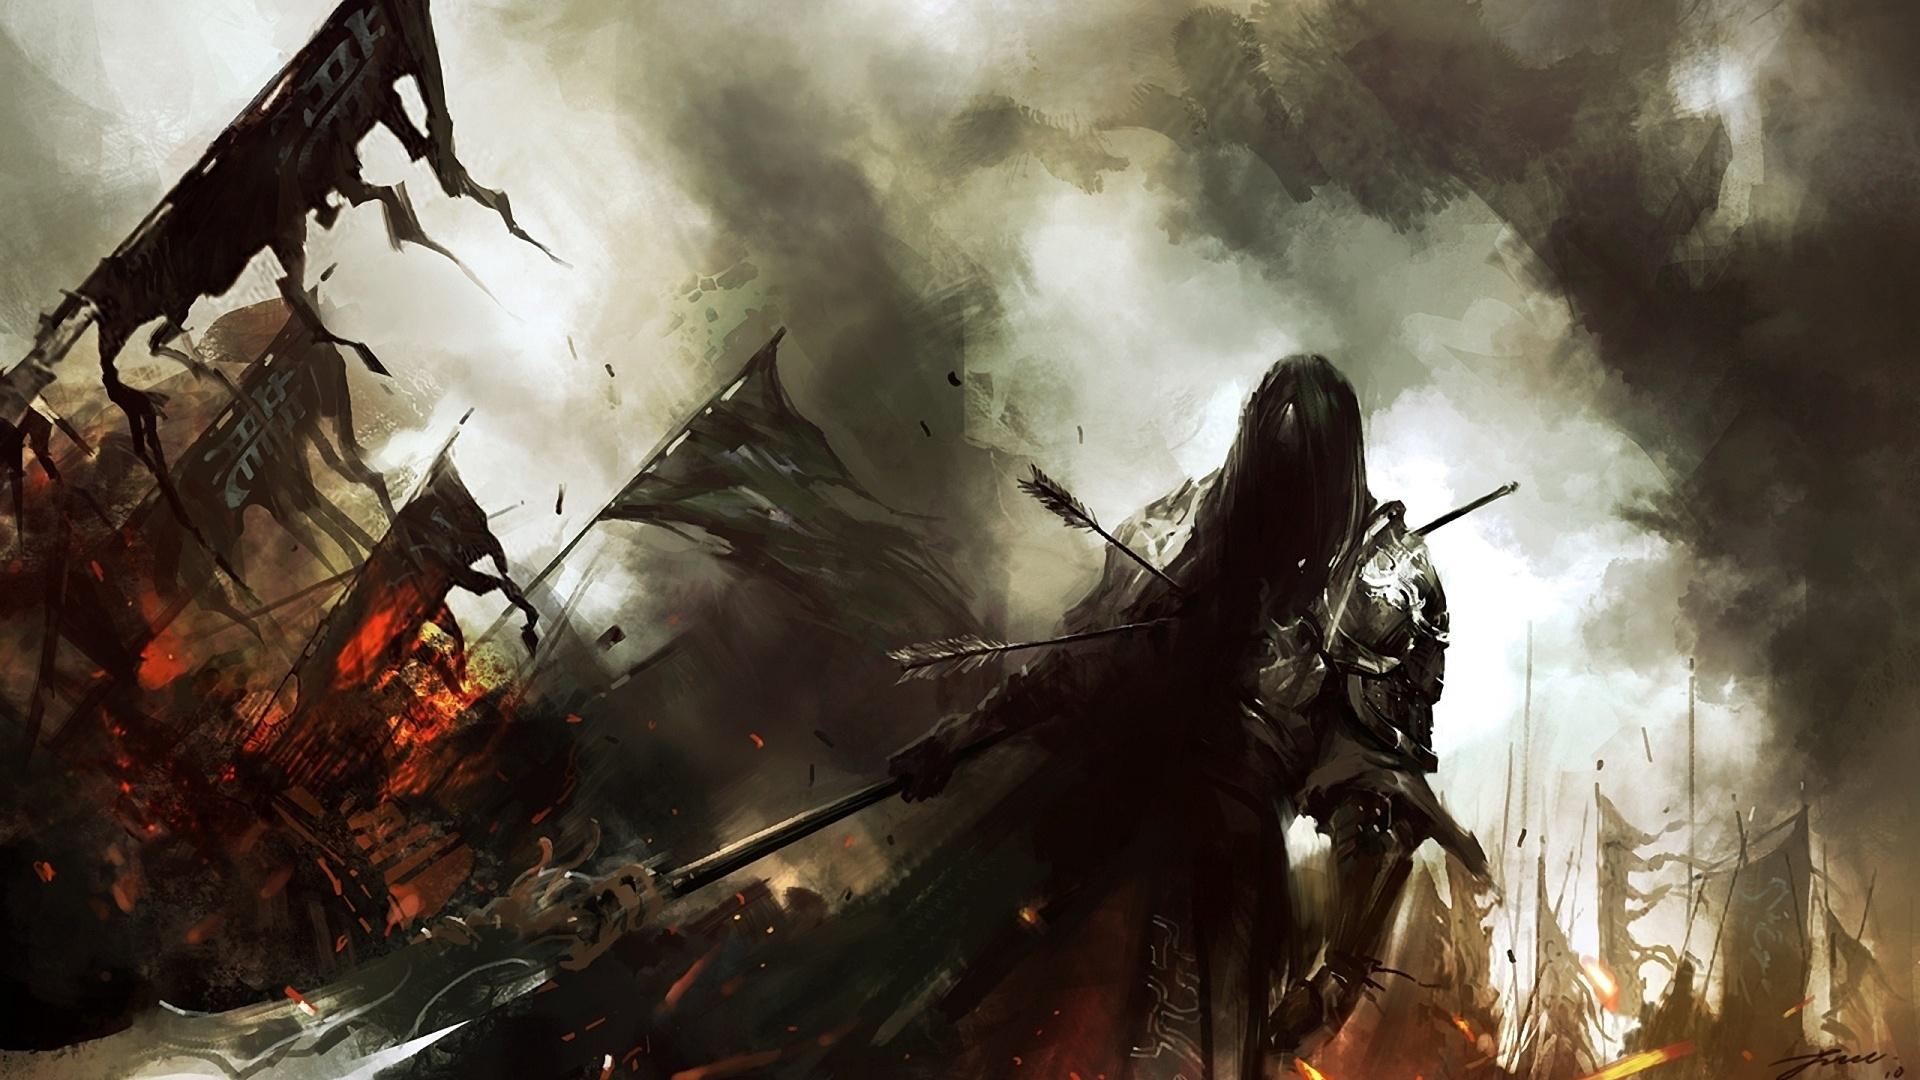 Lin Wenjun Fantasy Dark Warrior Knight Battle Weapons Army